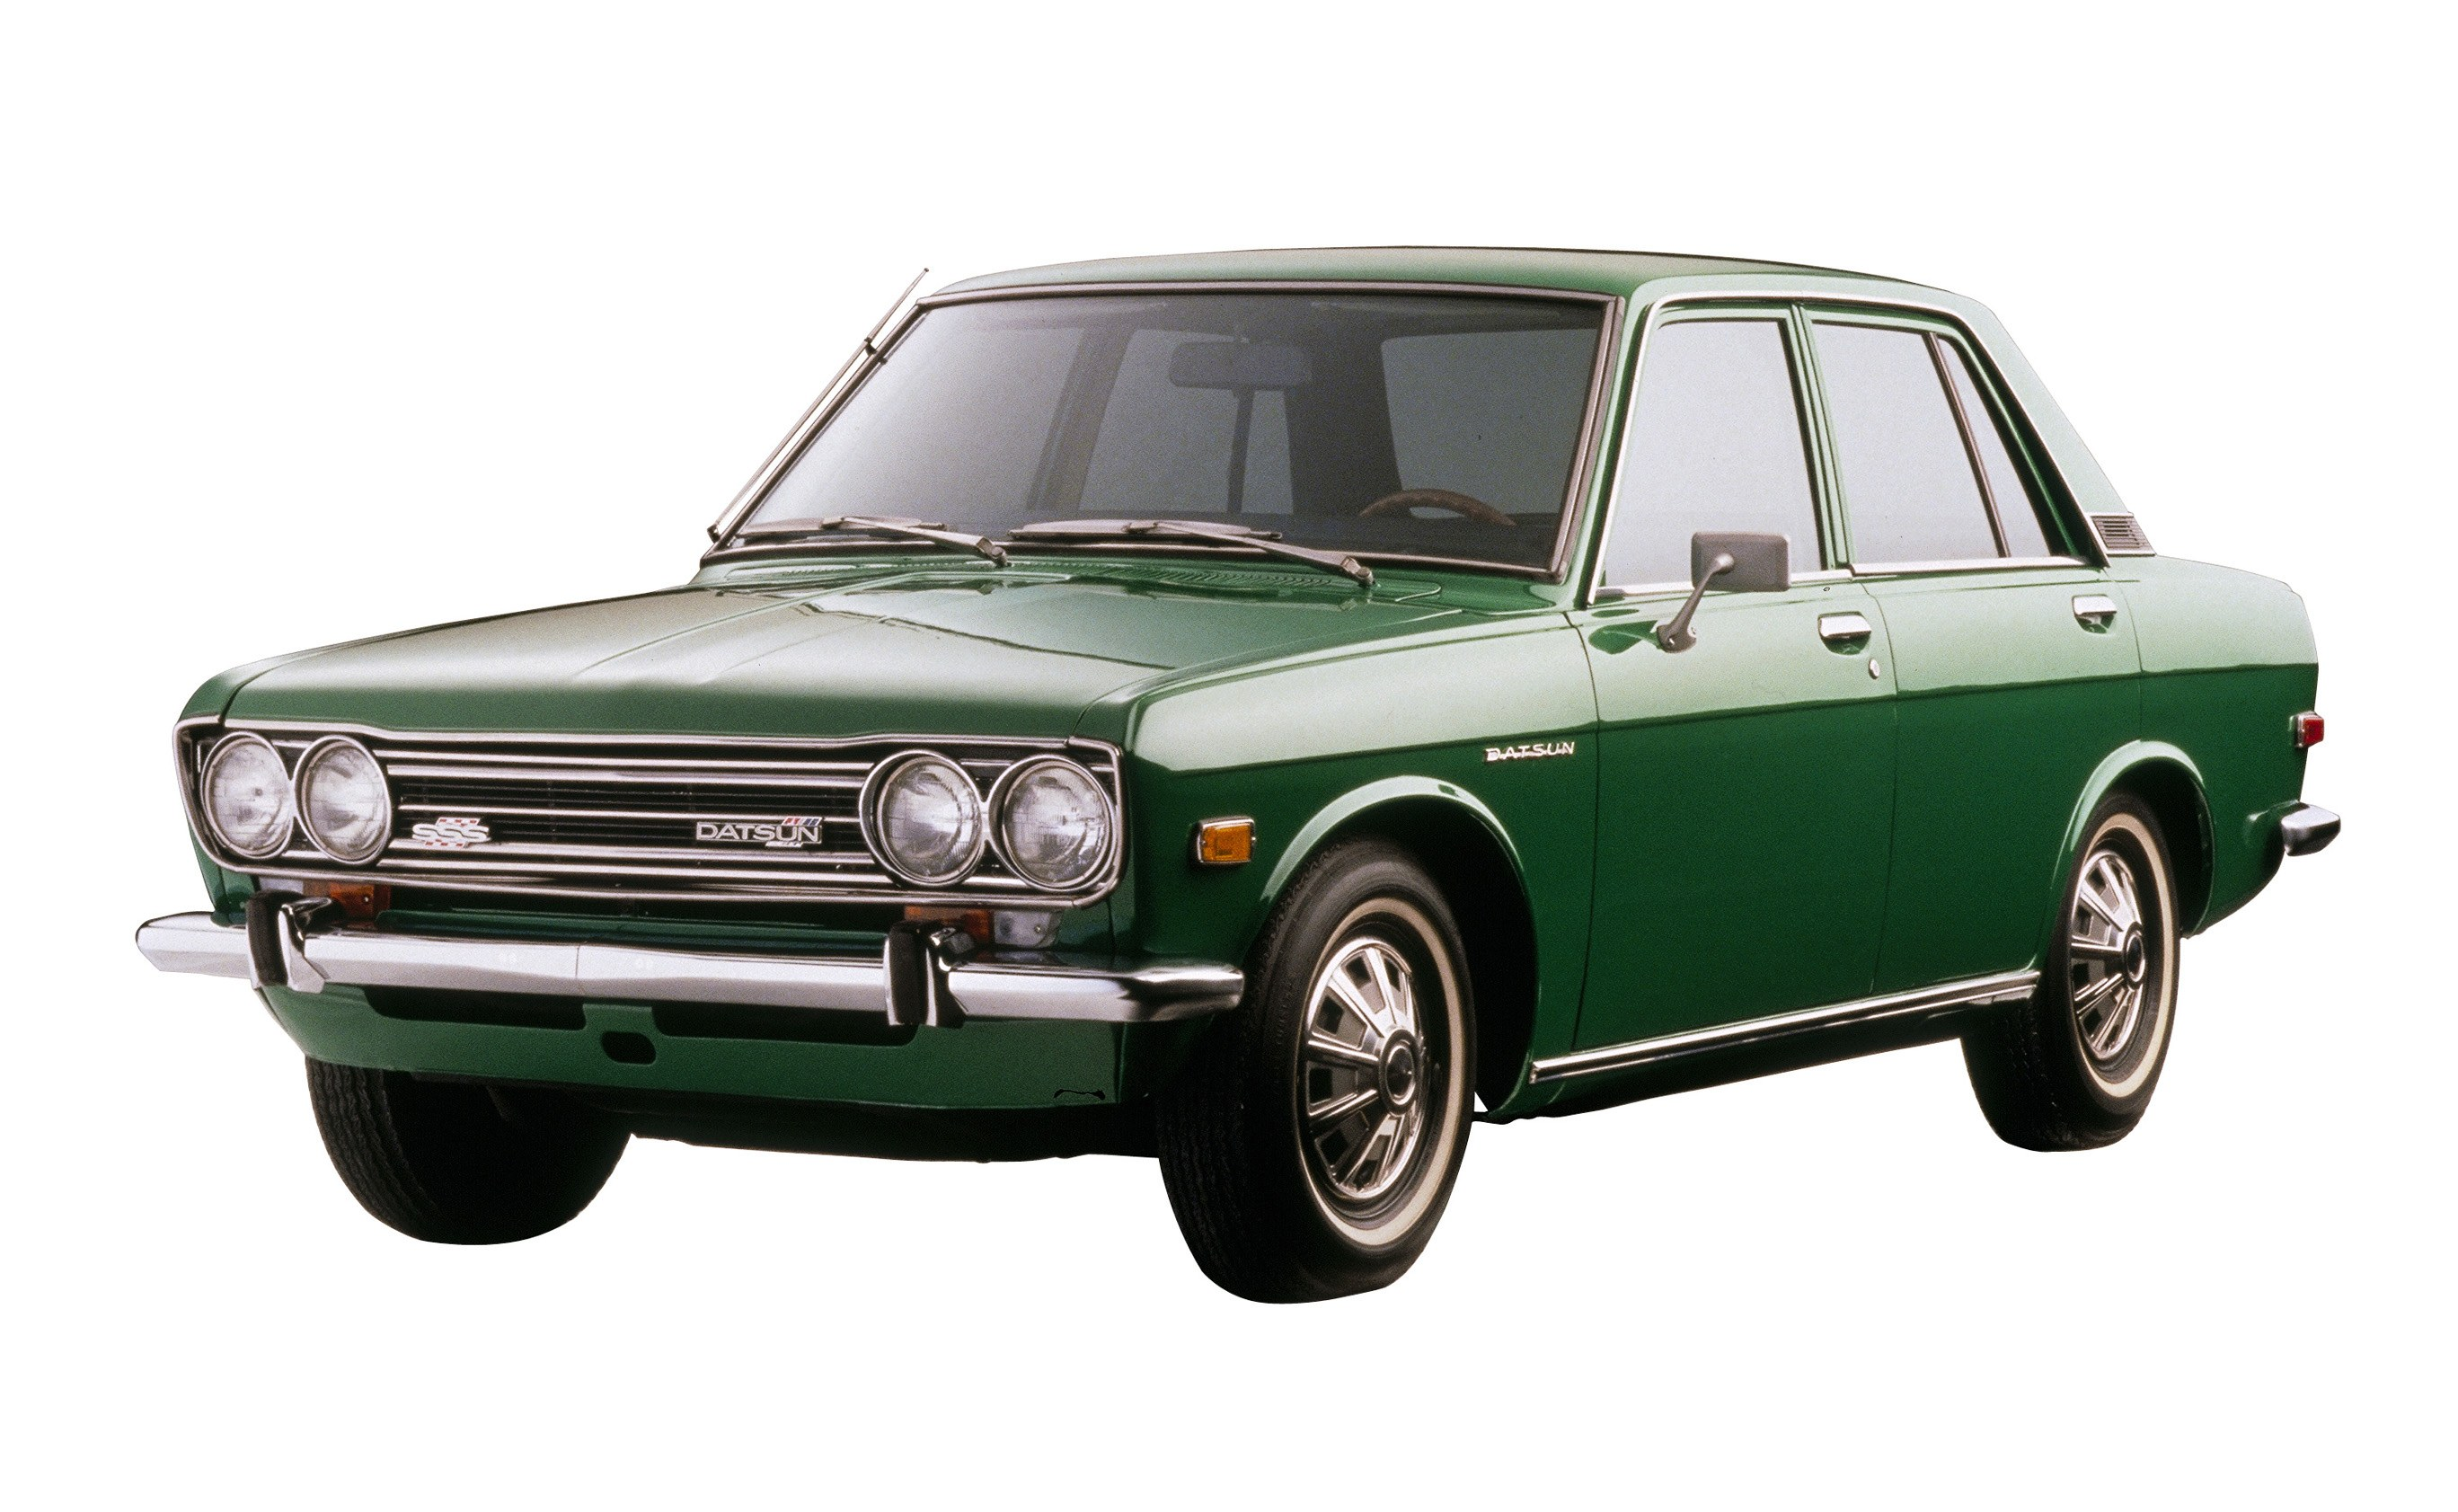 1972 Datsun 510 Sedan